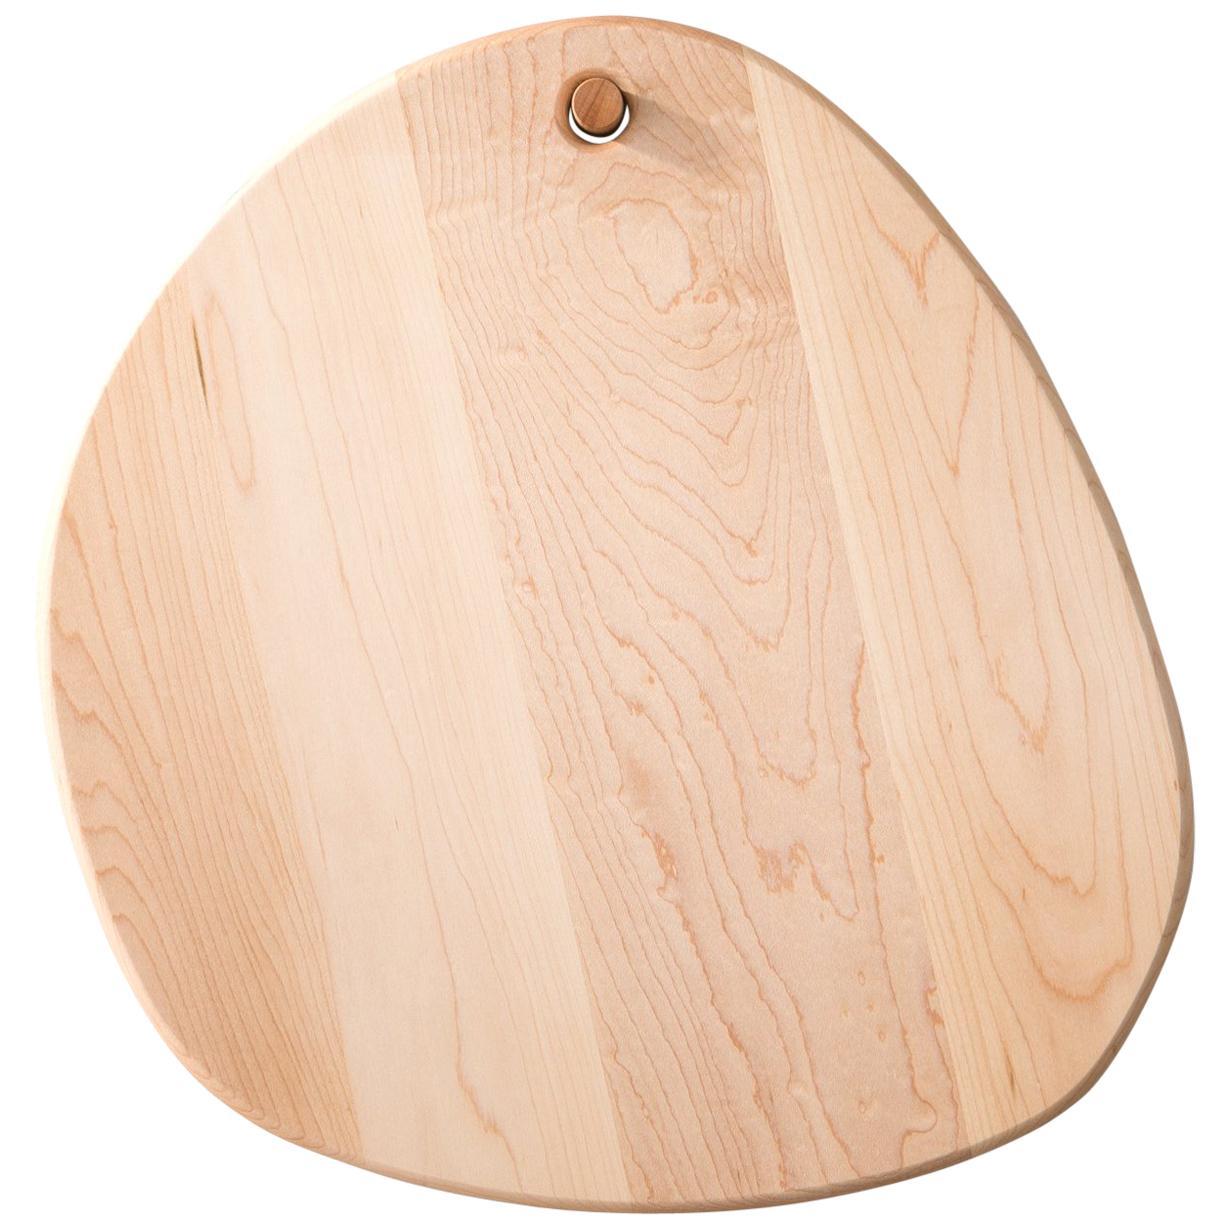 Maple Oval Pebble Cutting Board, in Stock